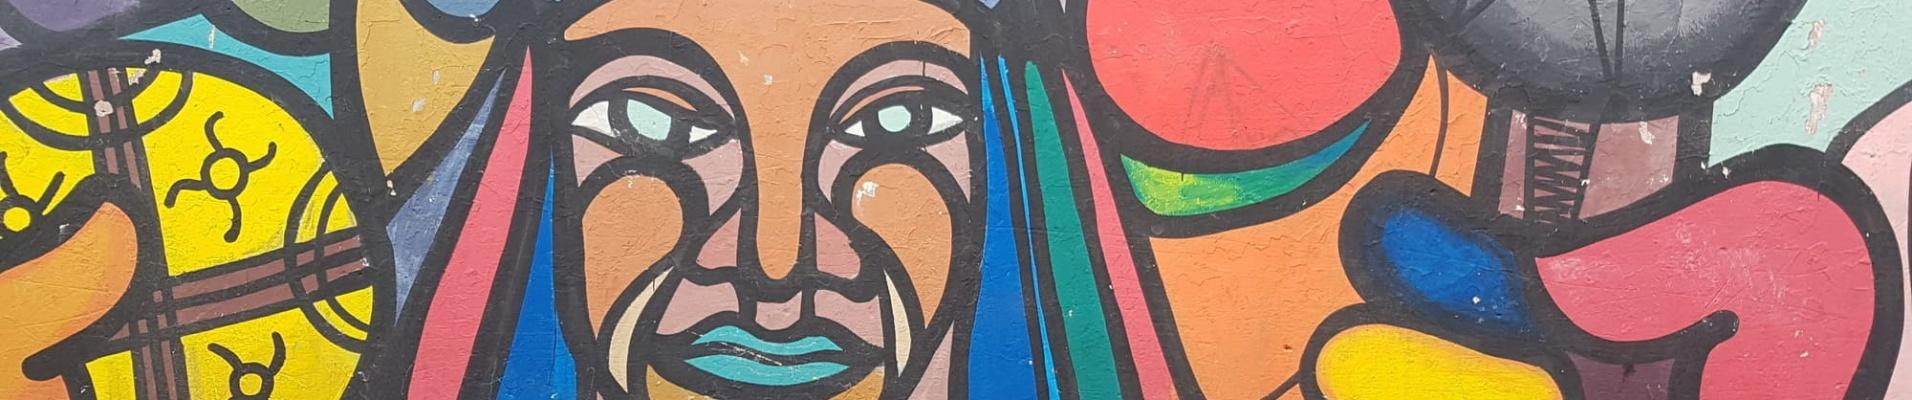 Peinture murale indien natif Chili. Vaccin Chili